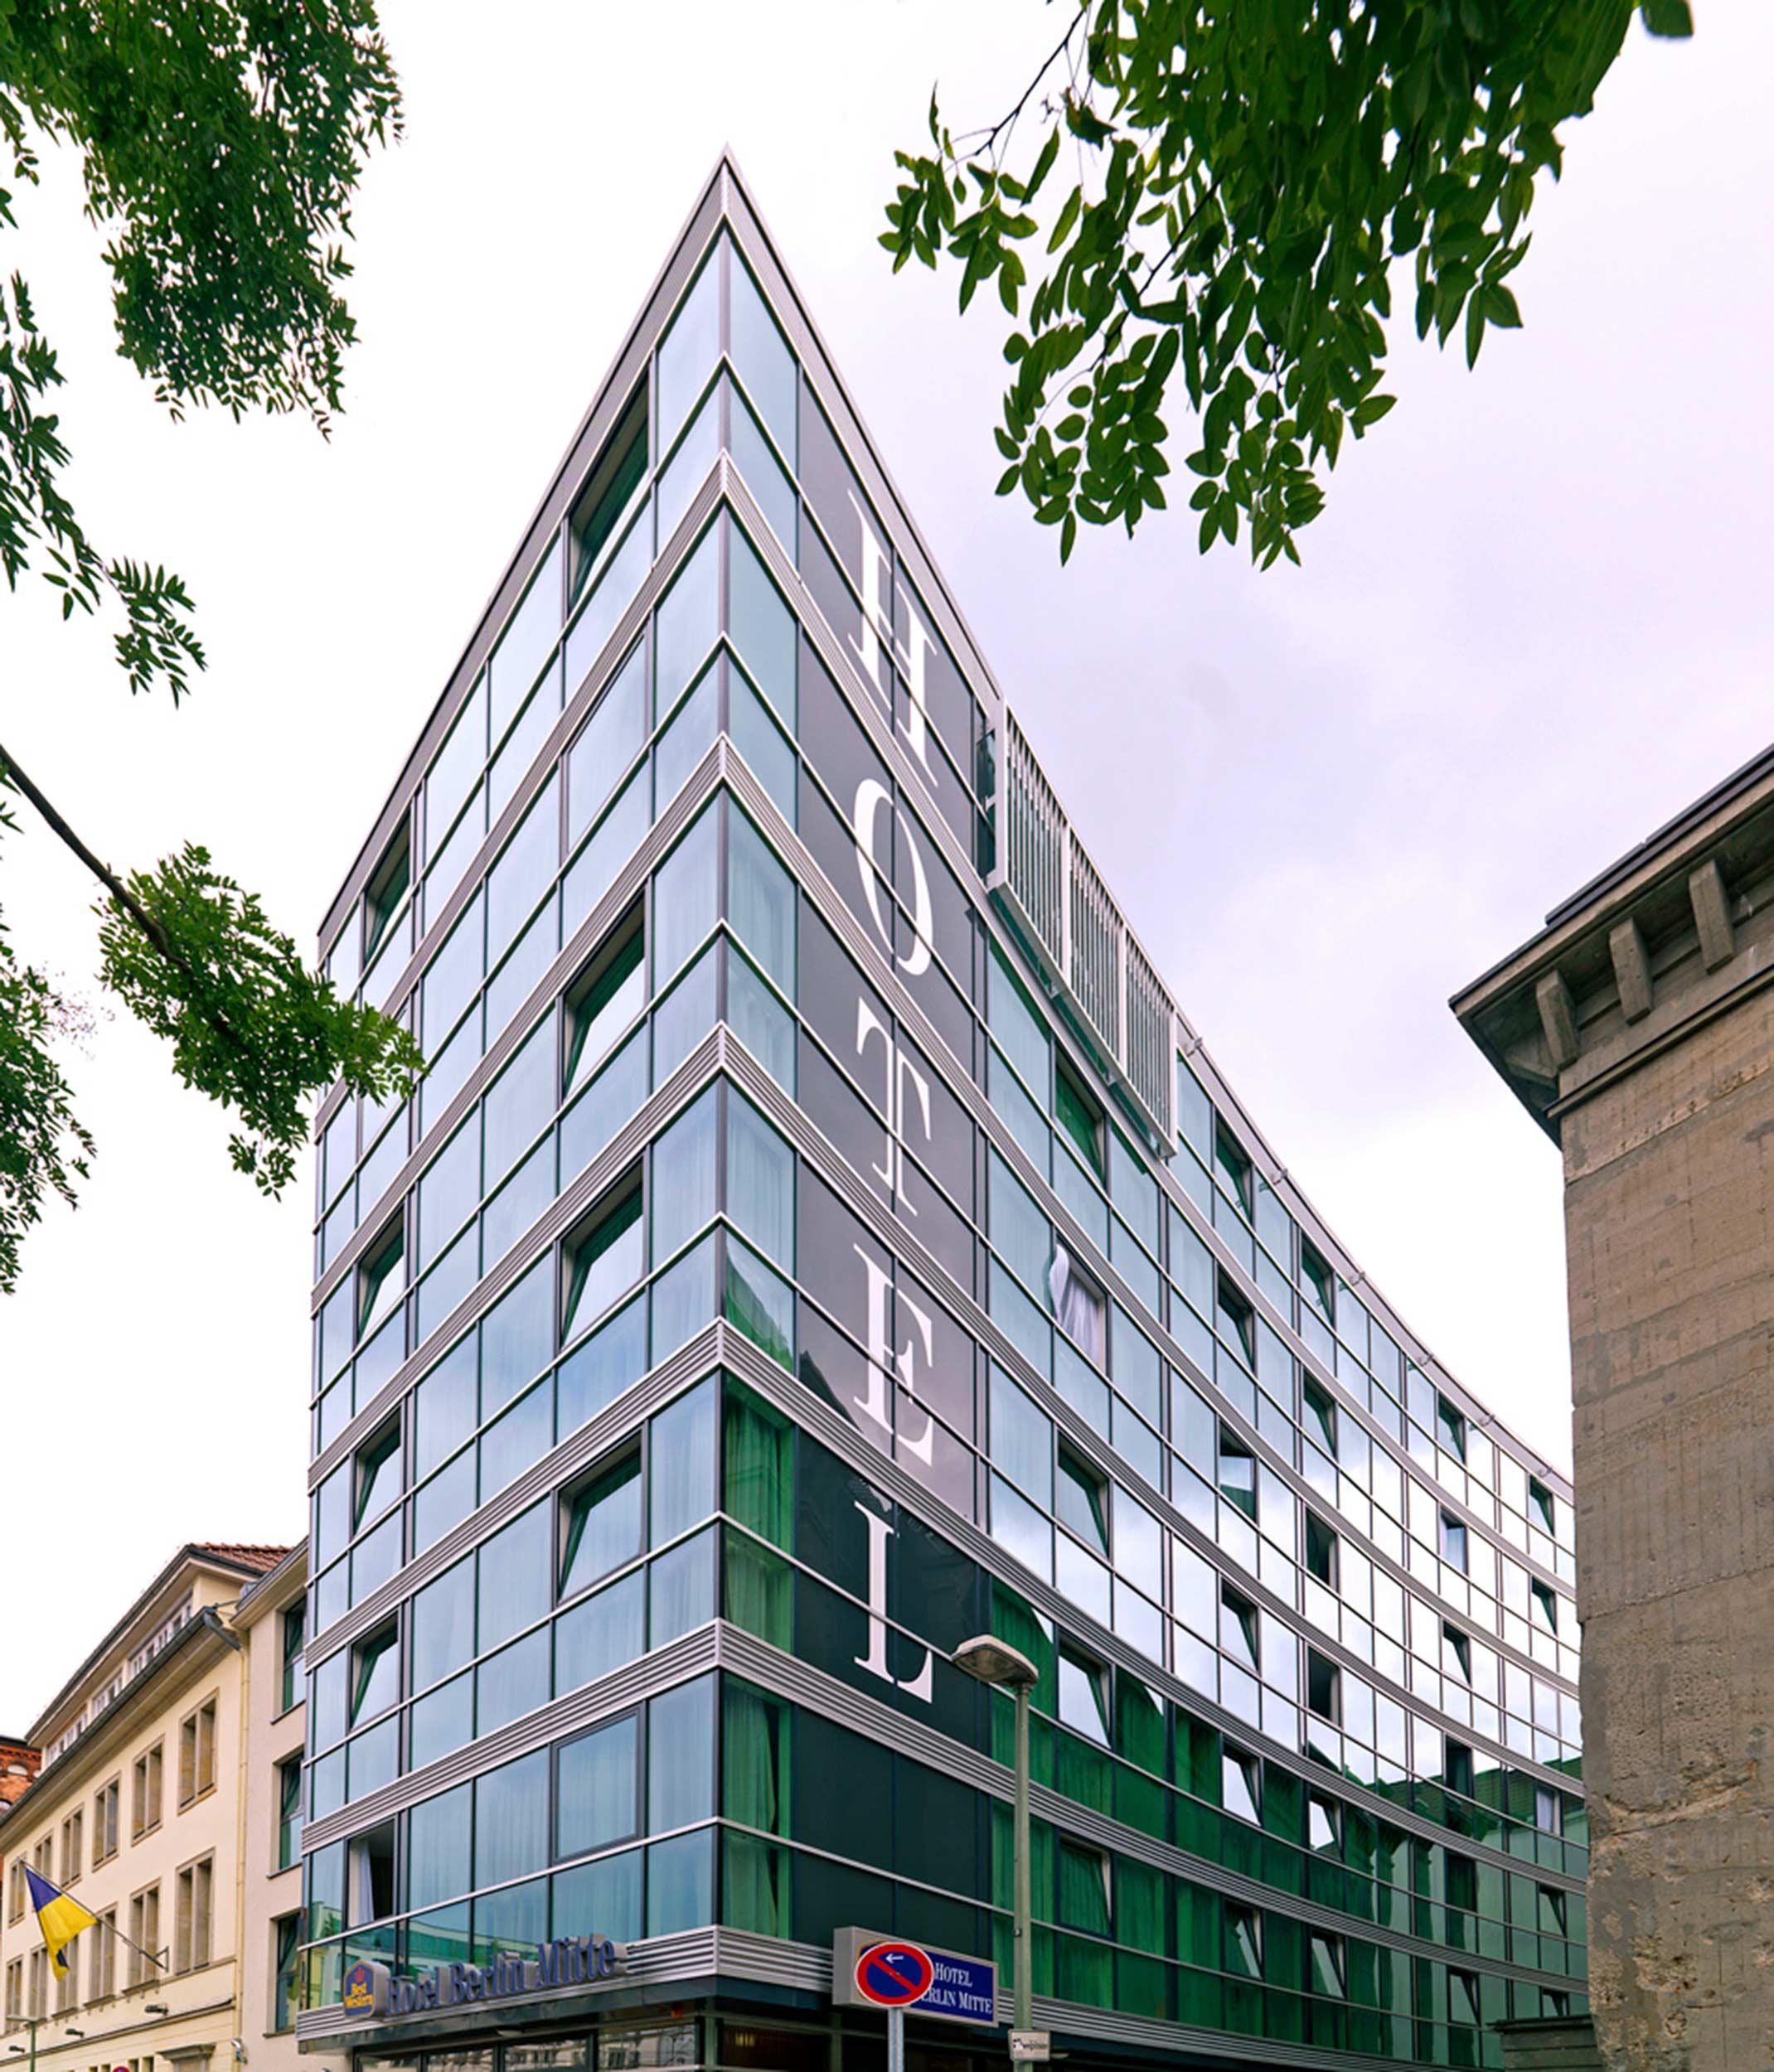 Hotelgebäude Albrechtstraße 25